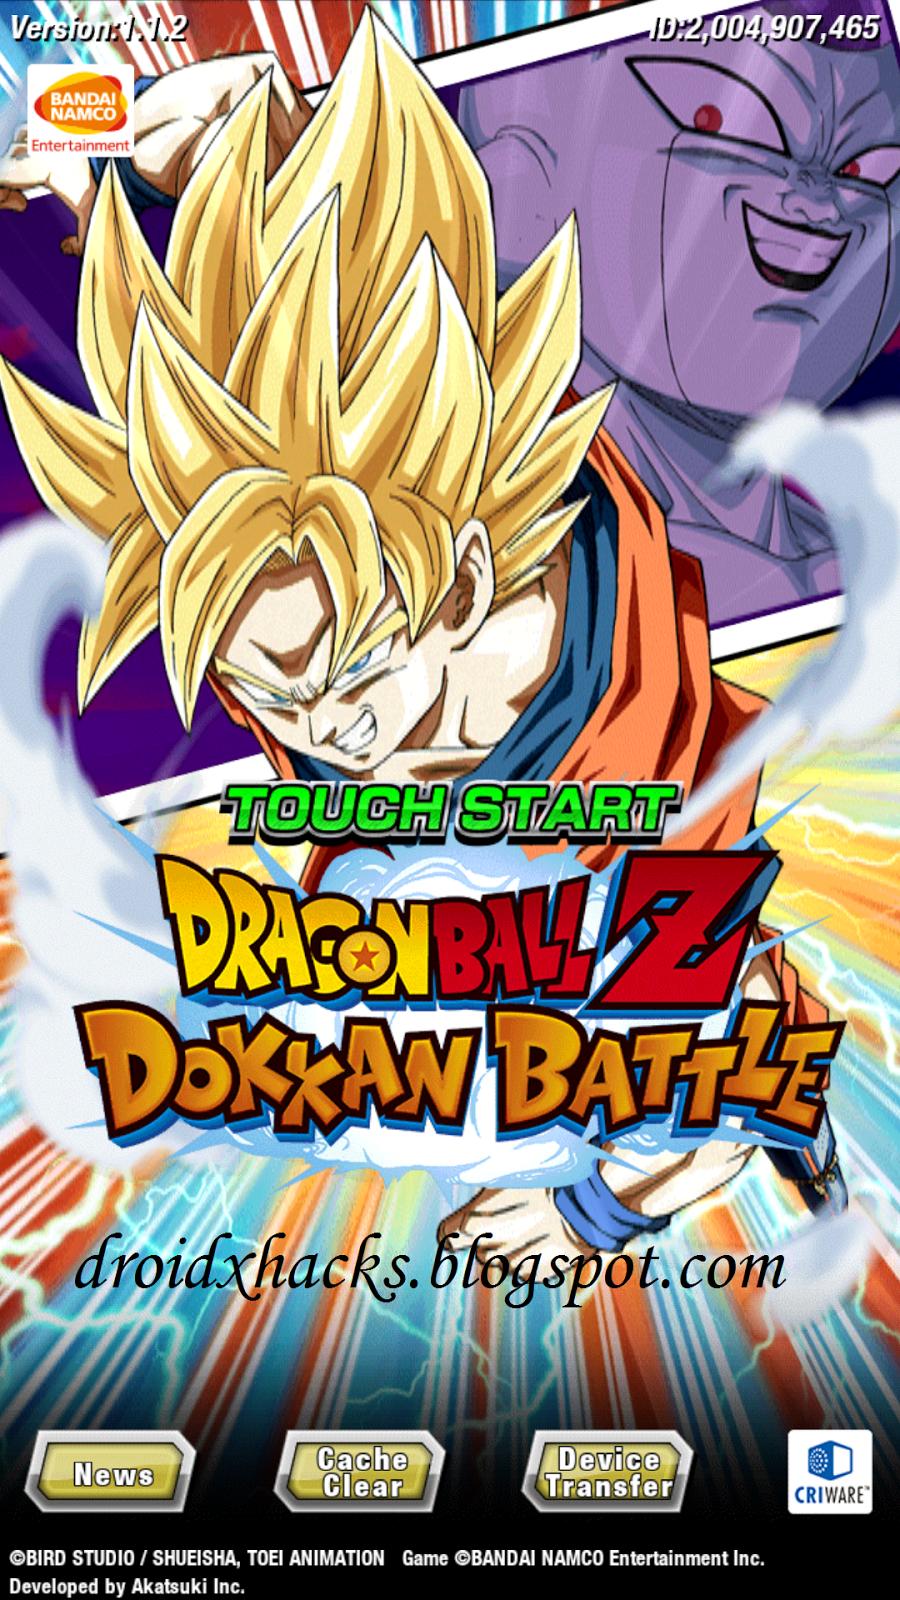 dragon ball dokkan battle apk mod 4.0.2